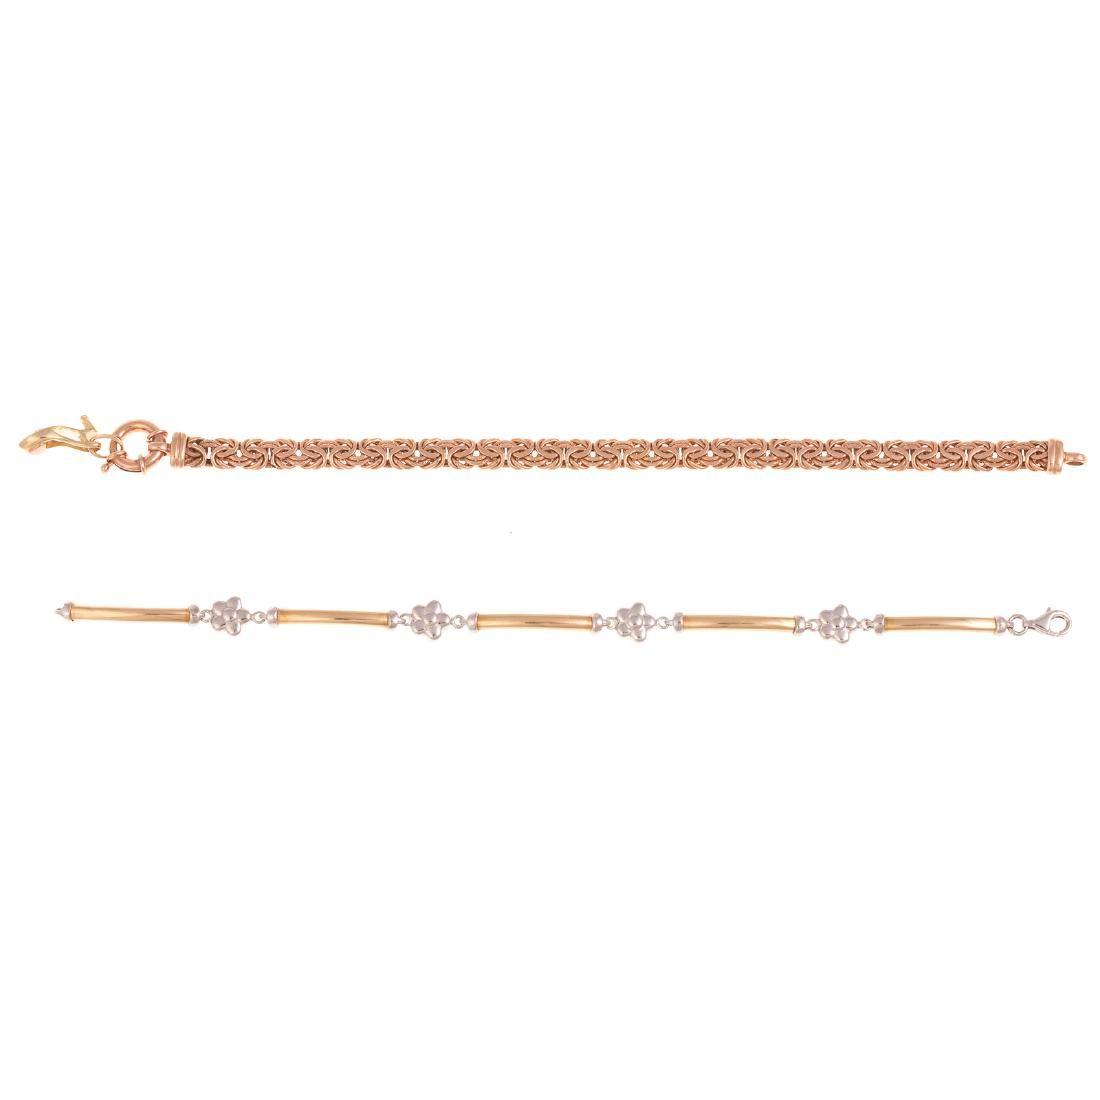 A Pair of Ladies 14K Gold Bracelets